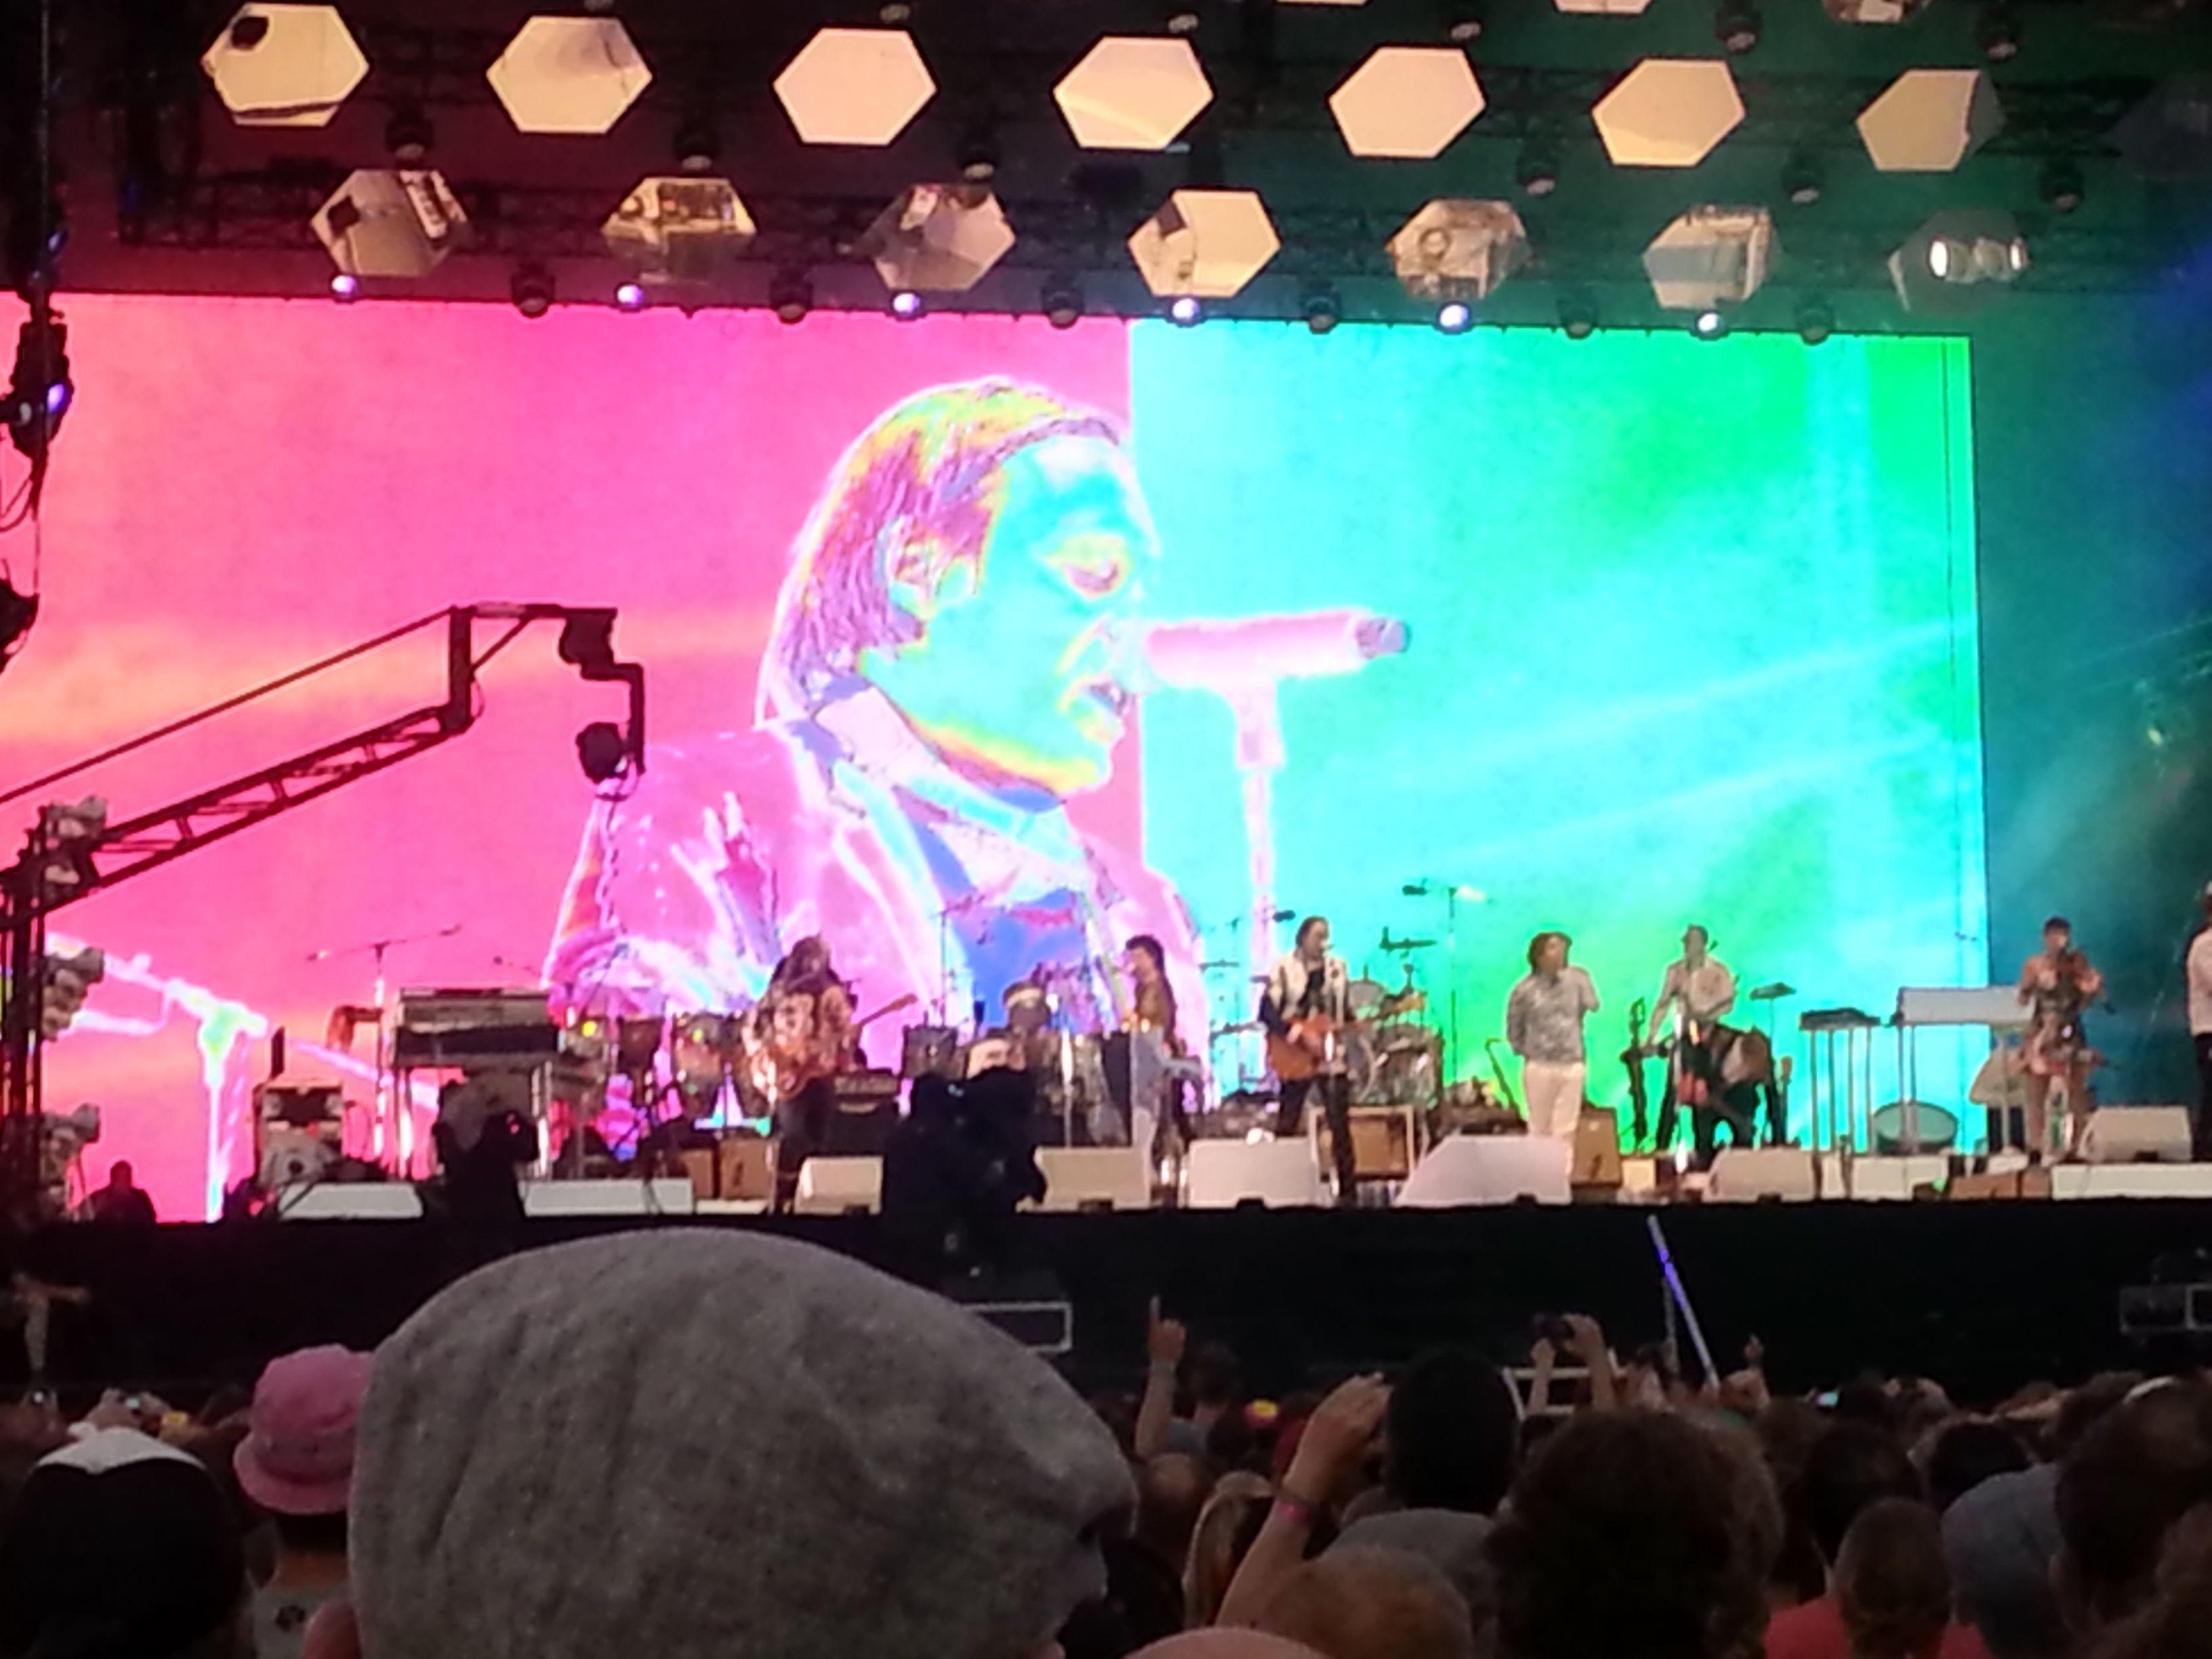 De band in de storm (Arcade Fire)